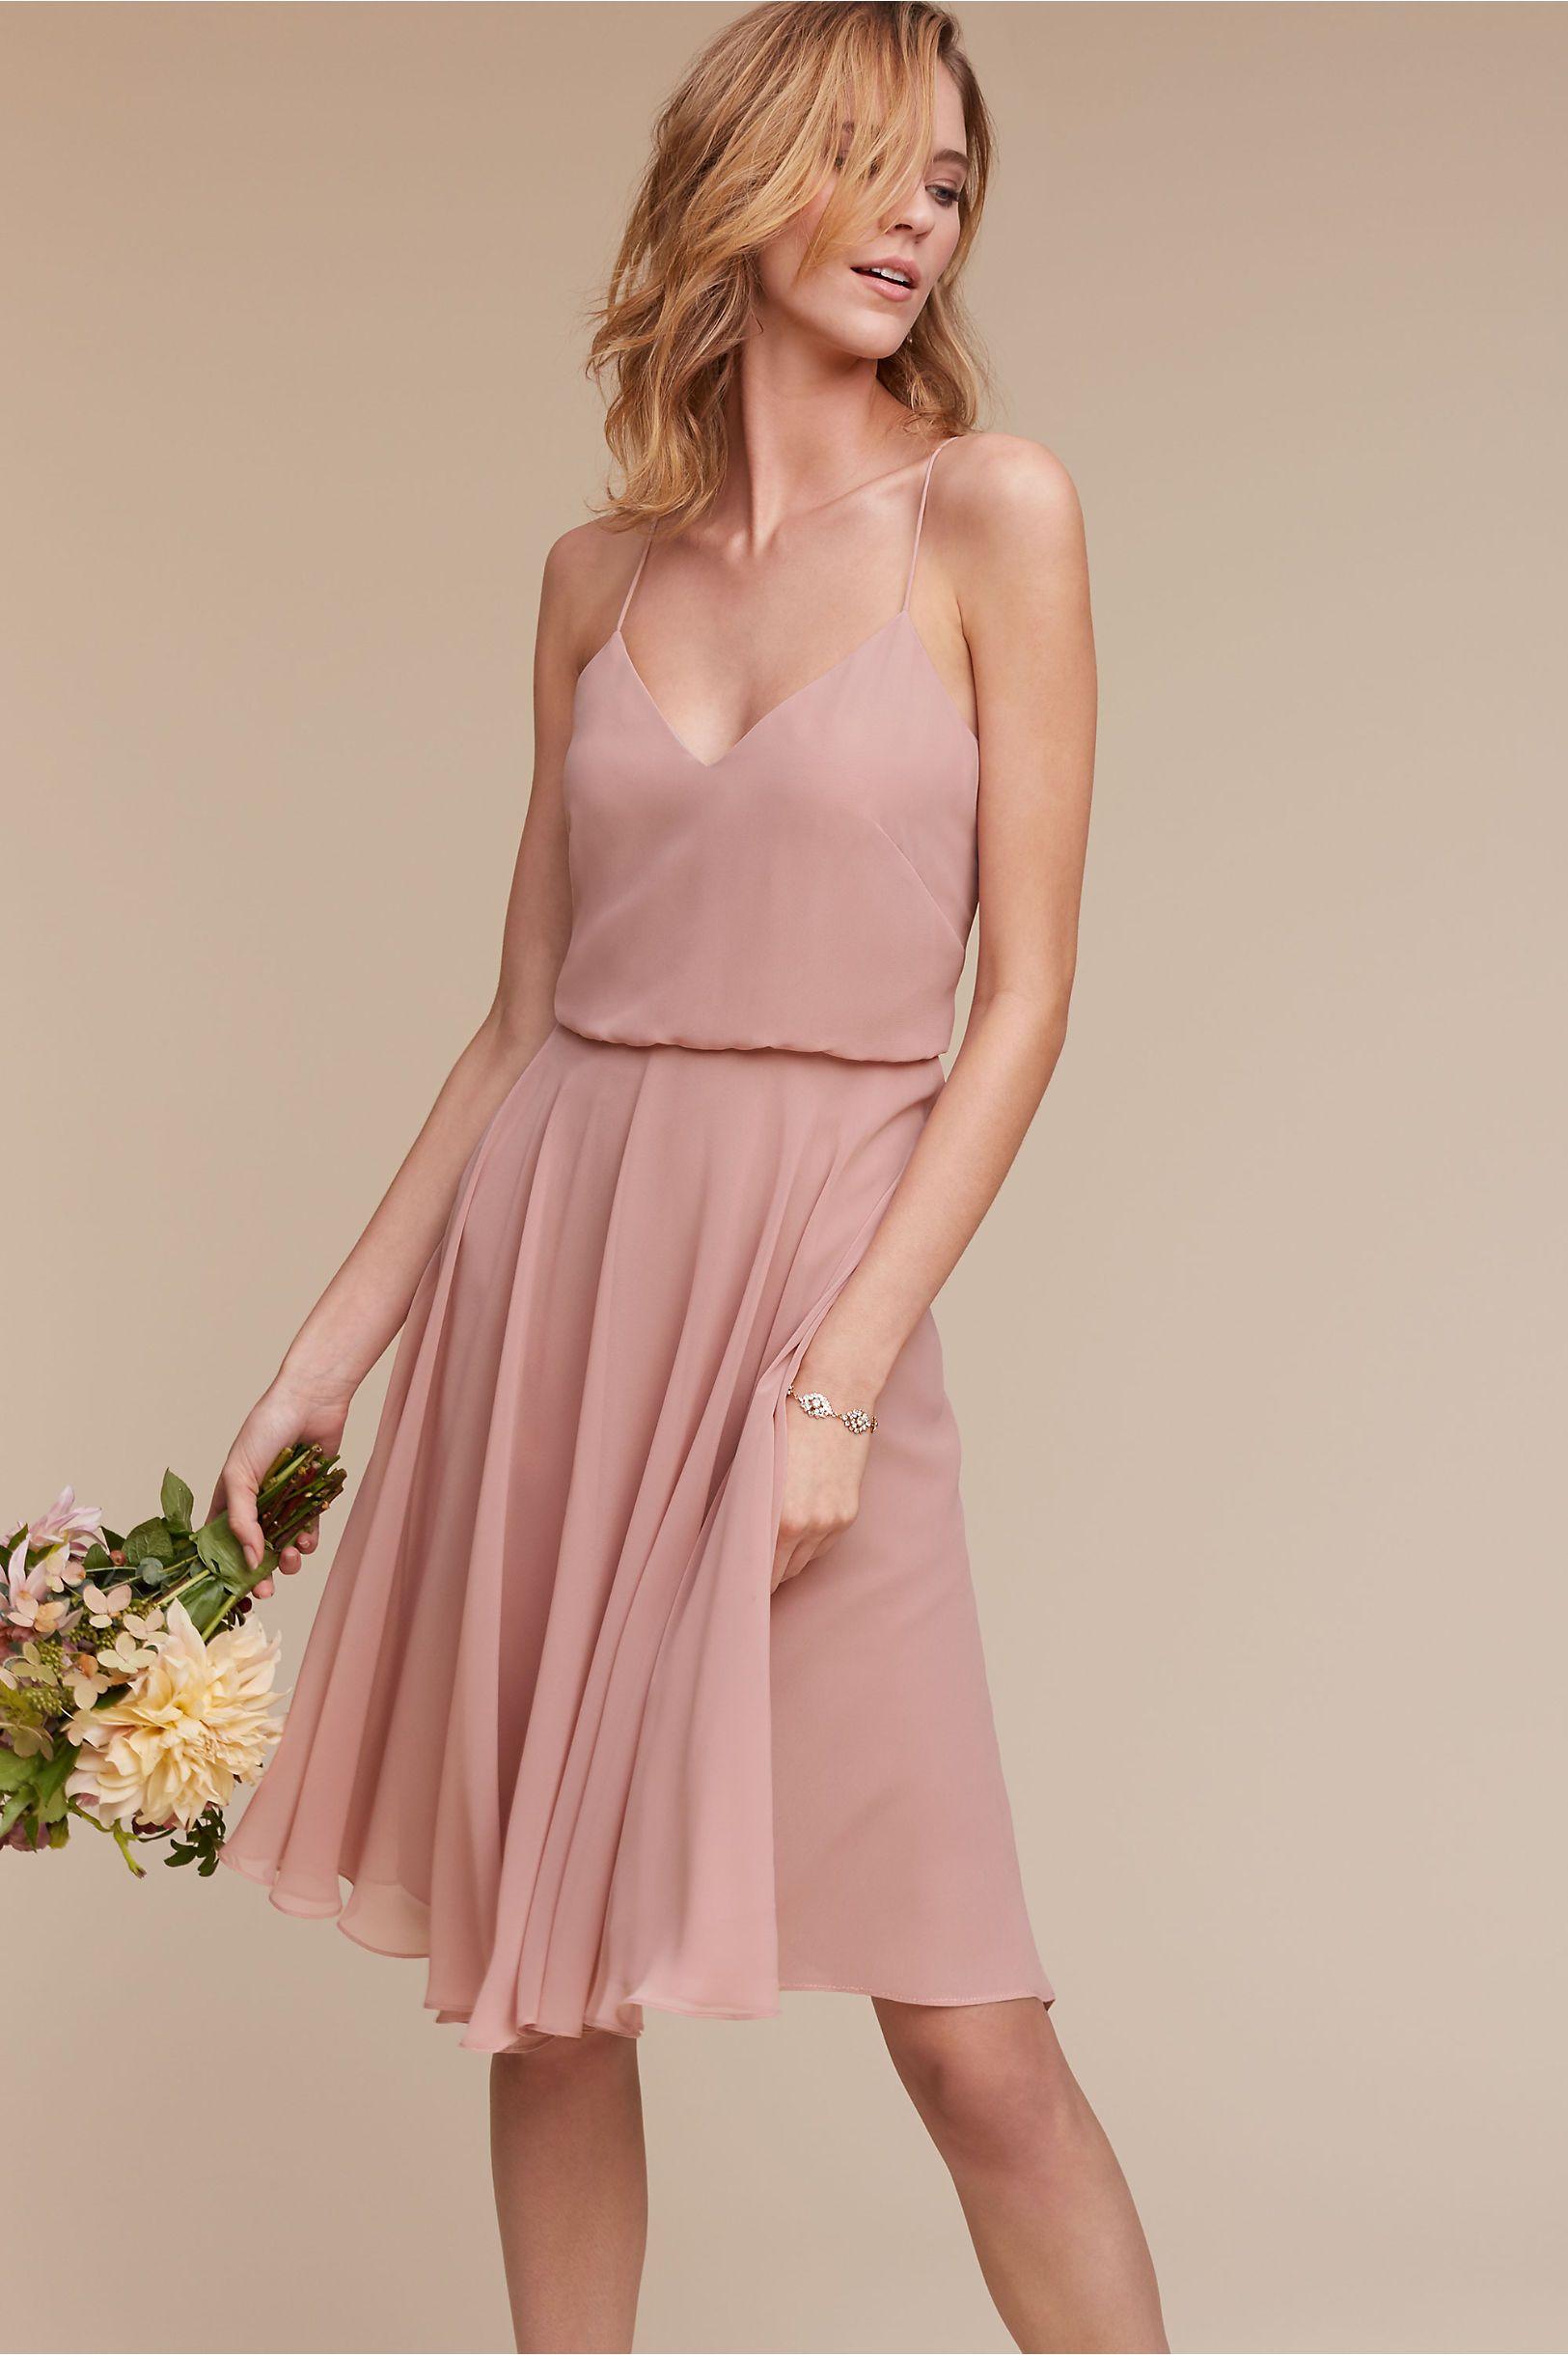 Bridesmaid dress rose quartz maybe navy bridesmaid dresses